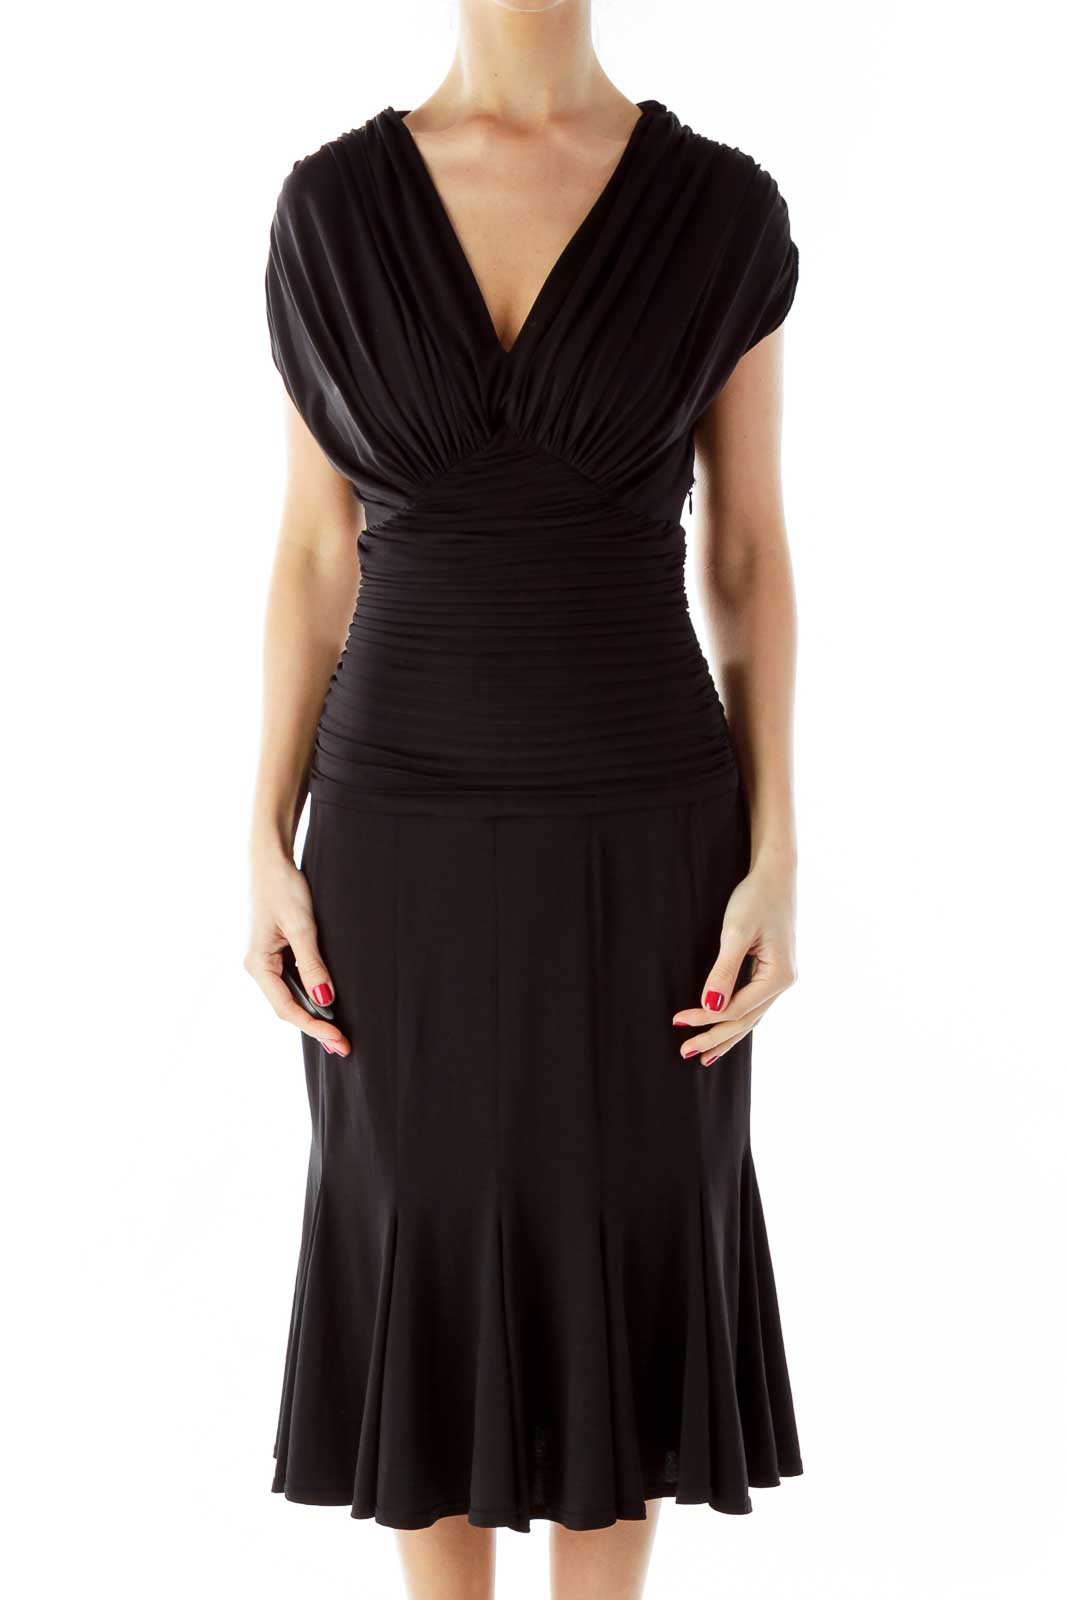 Black Scrunched Cocktail Dress Front